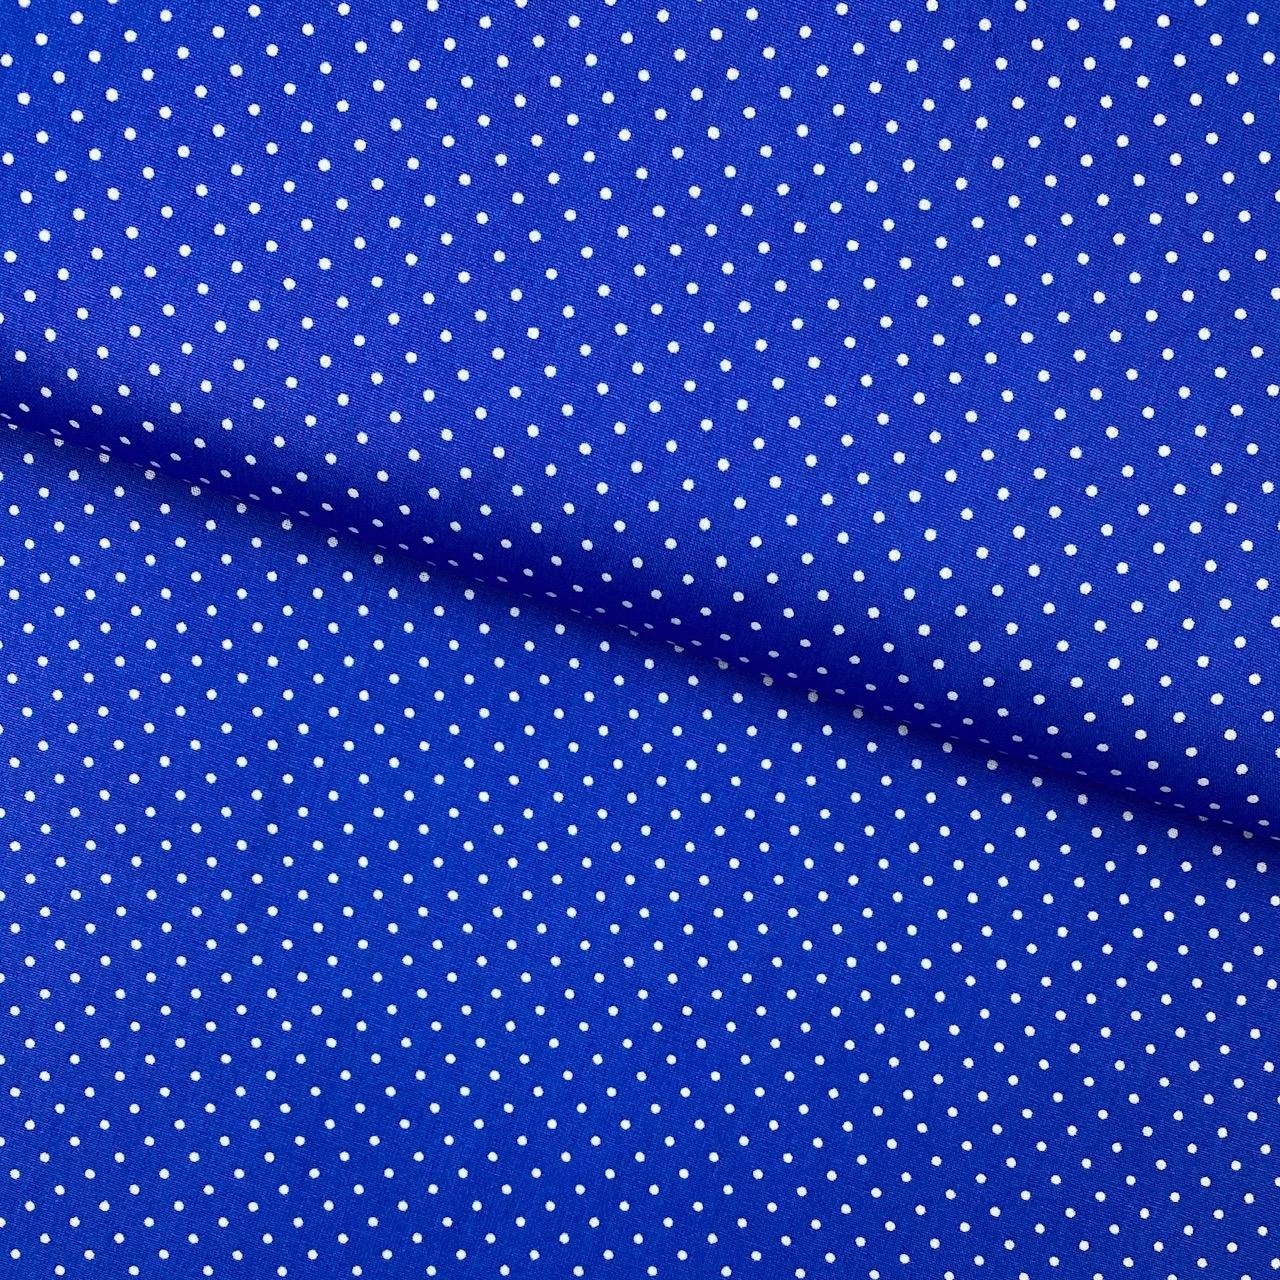 Baumwollpopeline, Punkte, royalblau. Art. SW11377